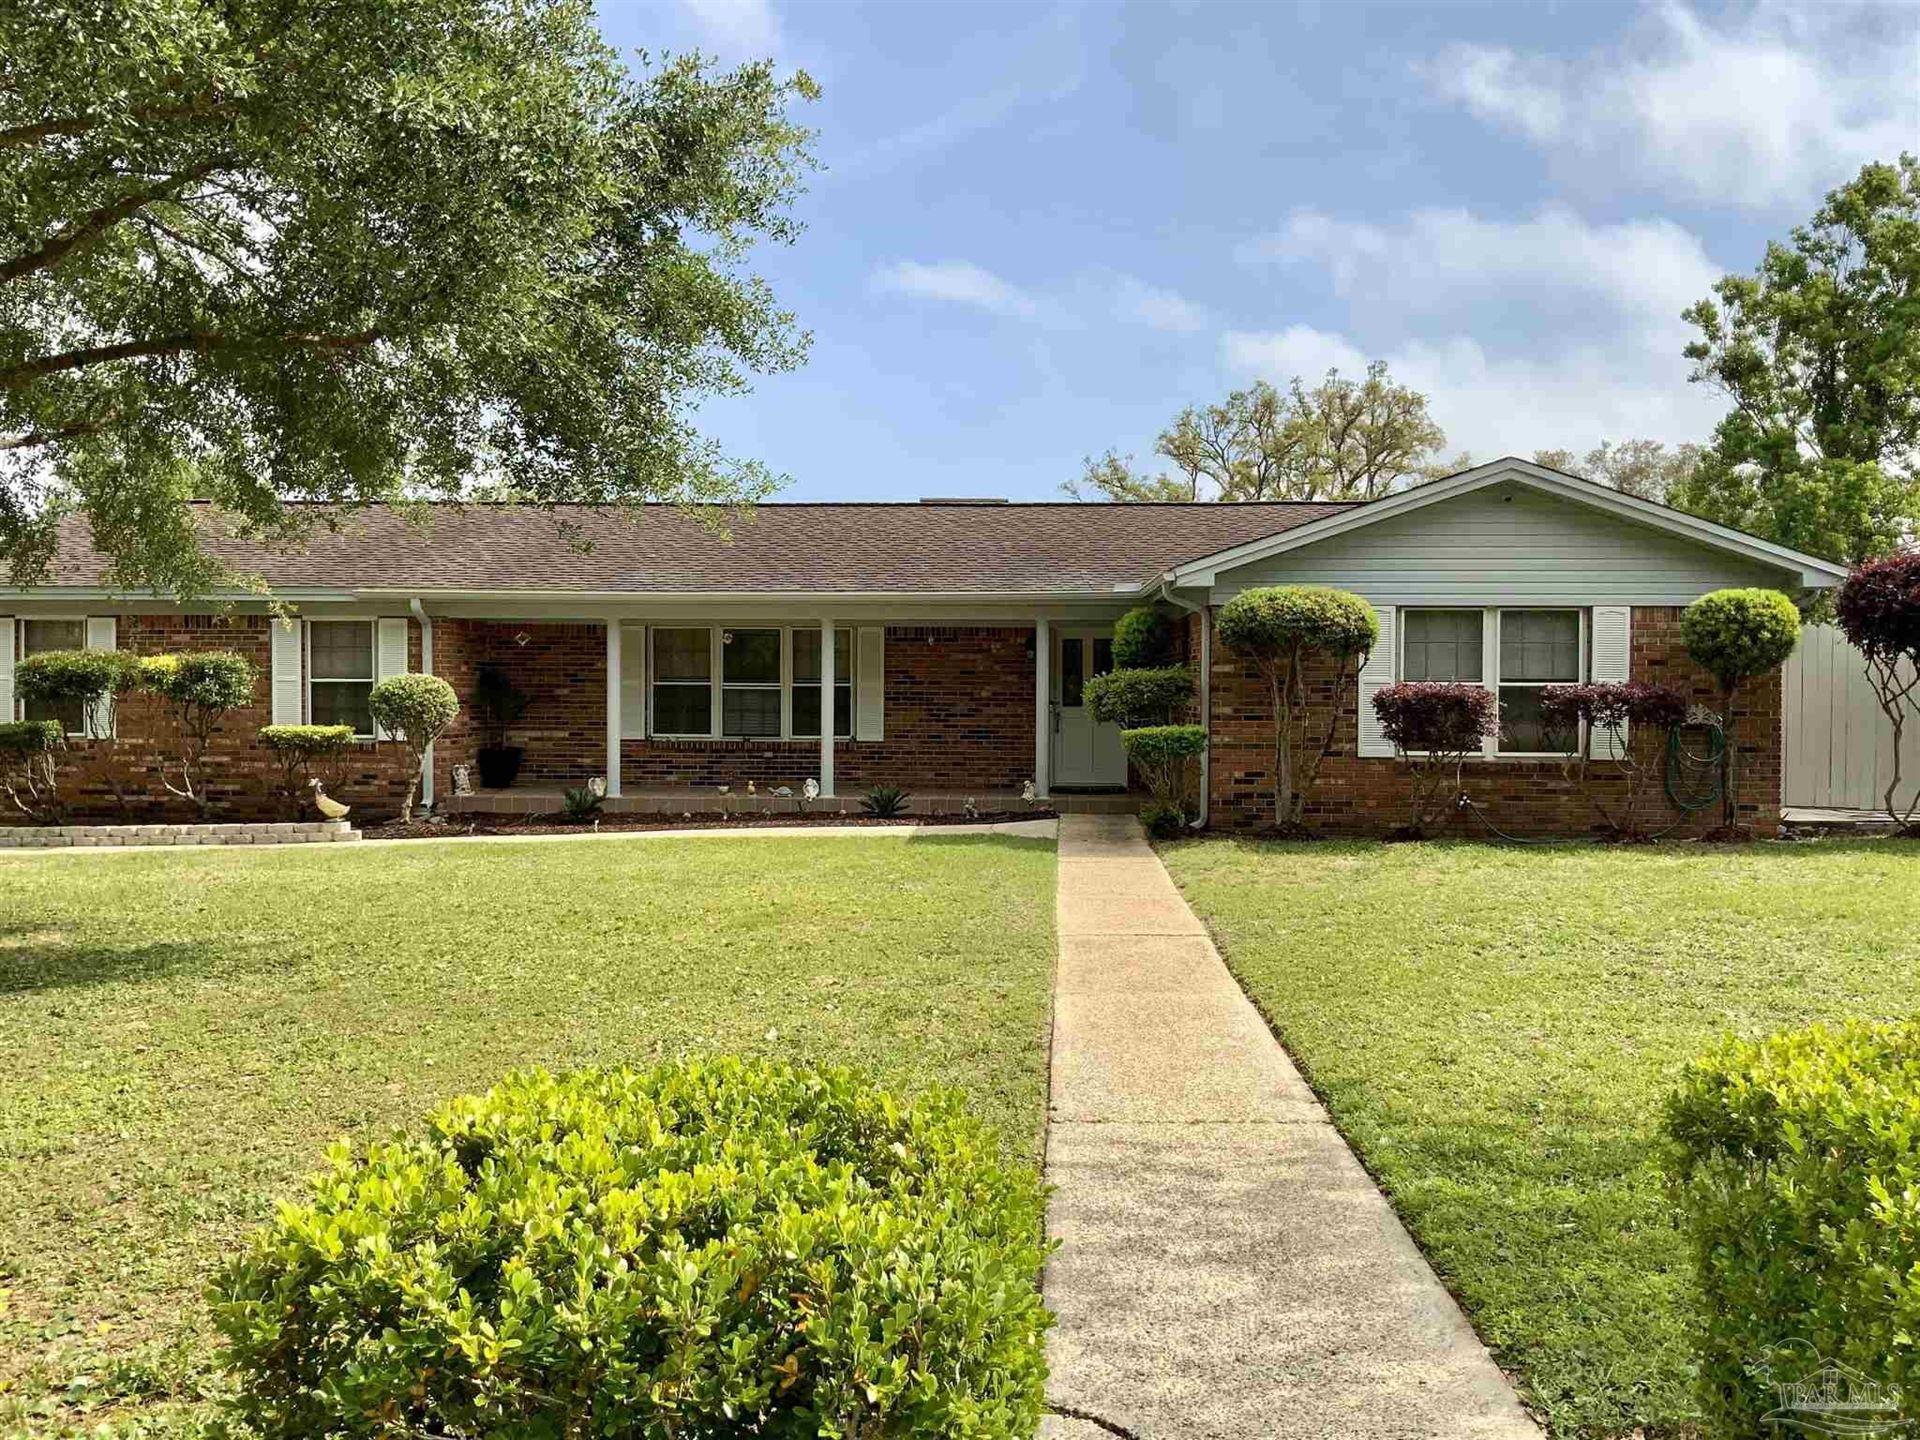 6501 PENTON ST, Pensacola, FL 32506 - #: 588857